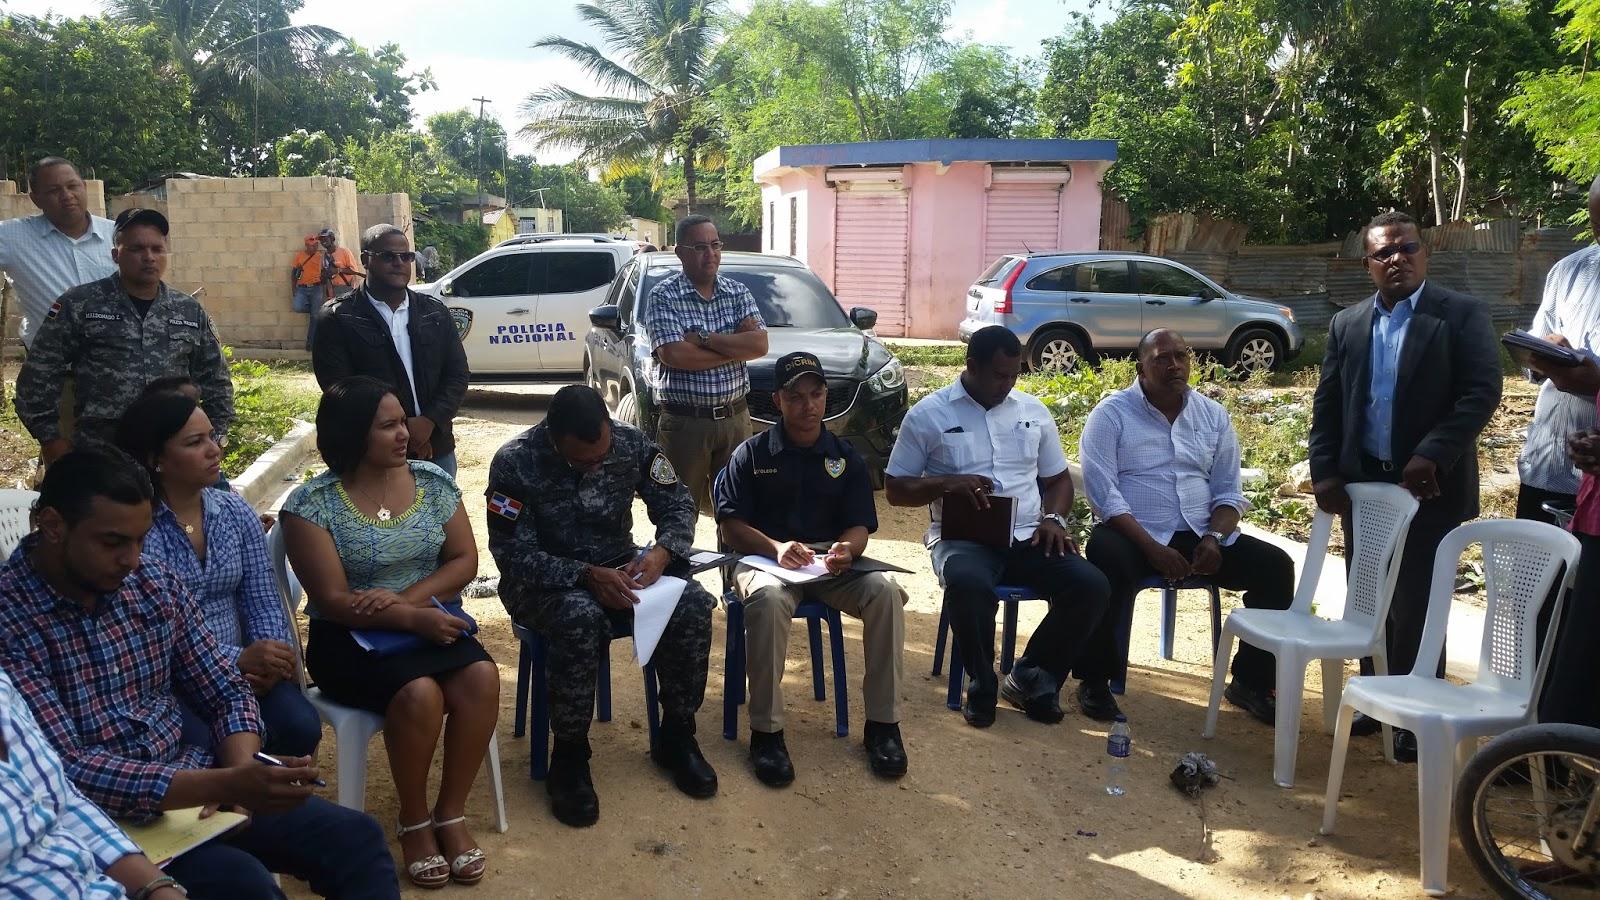 Ministerio publico y policia nacional realizan encuentro con moradores de sector villa for Ministerio policia nacional